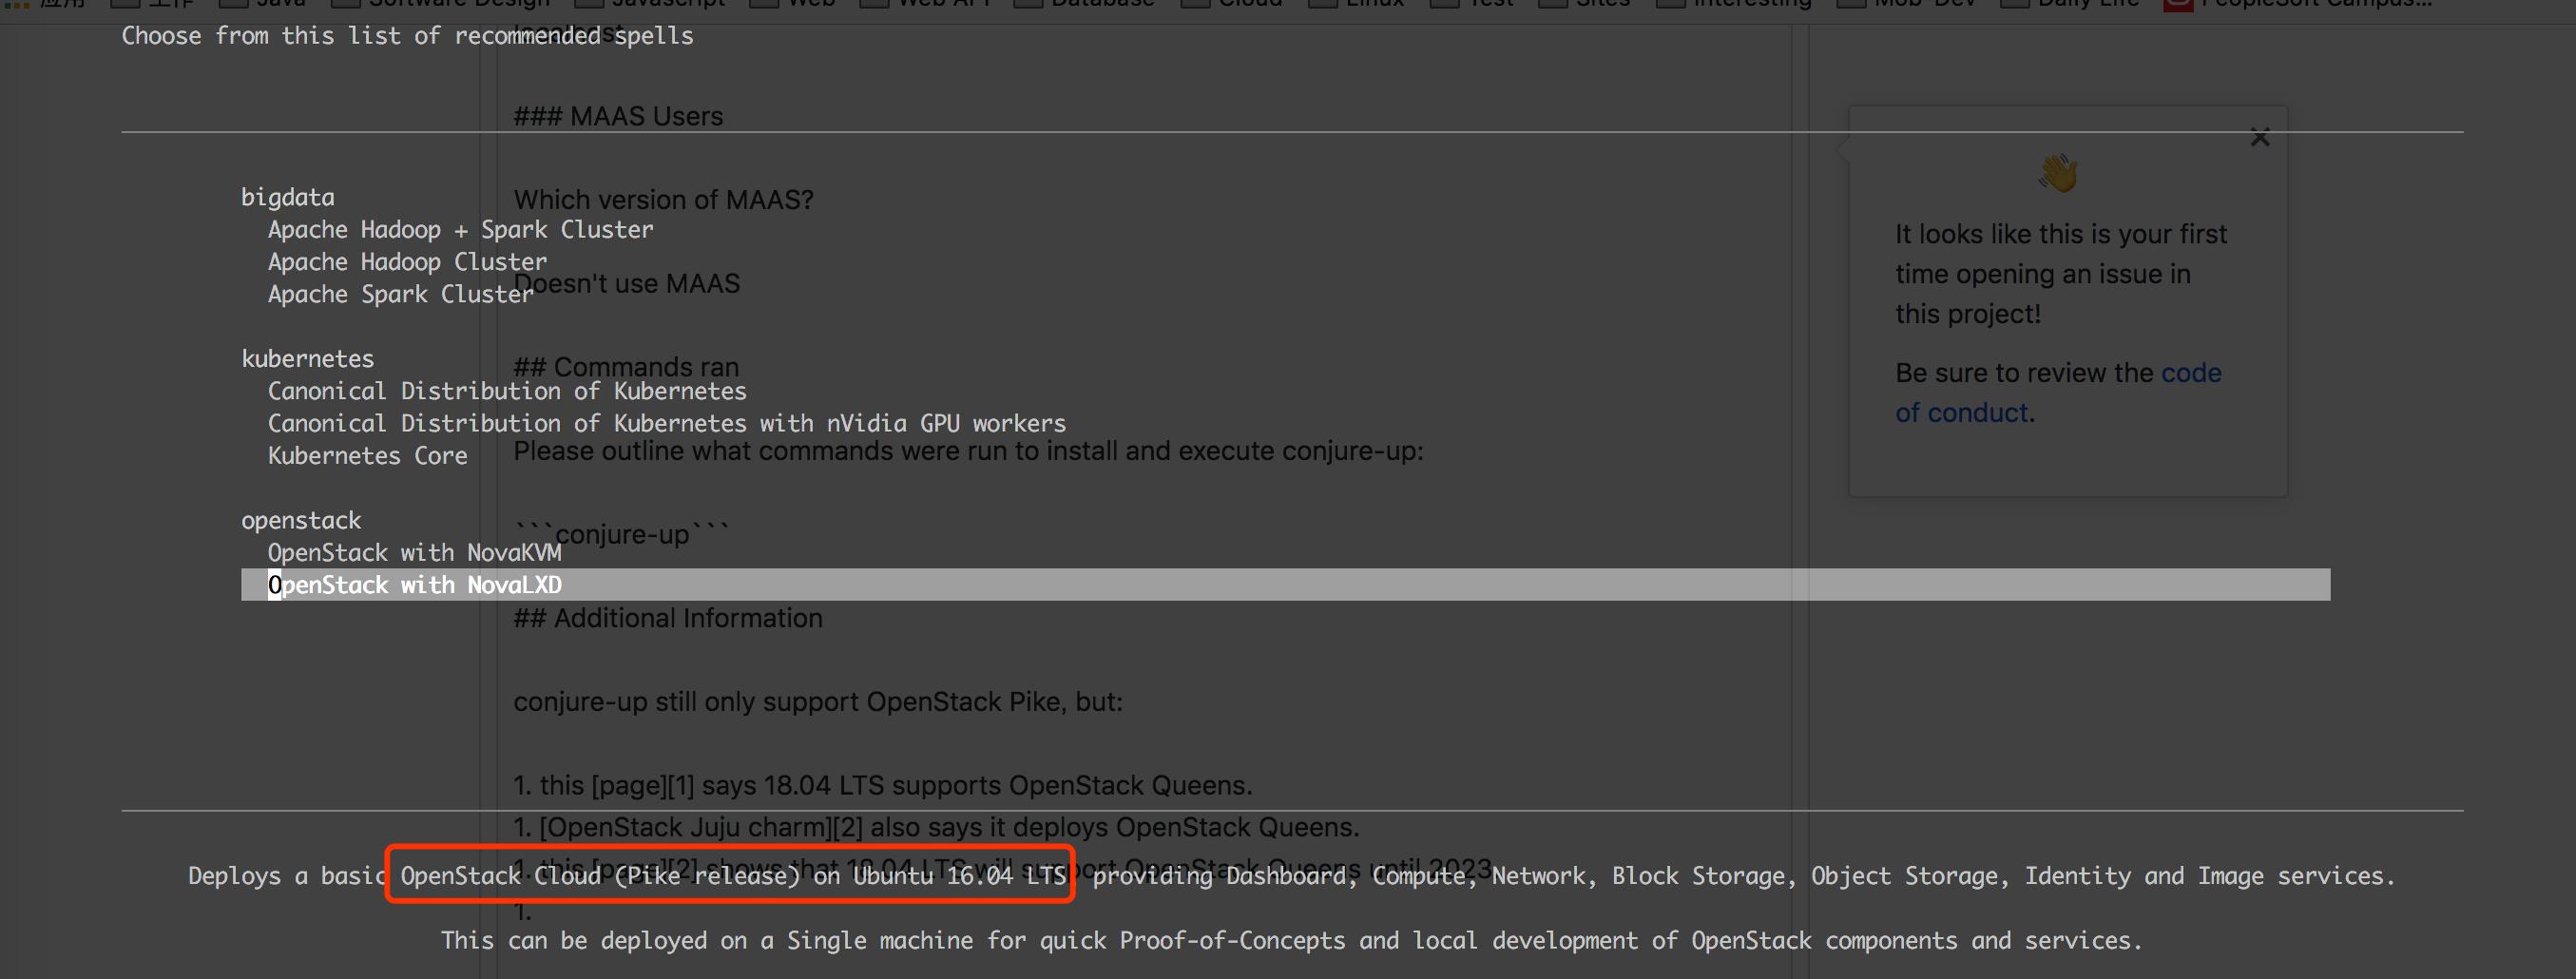 Ubuntu Cloud Image Release